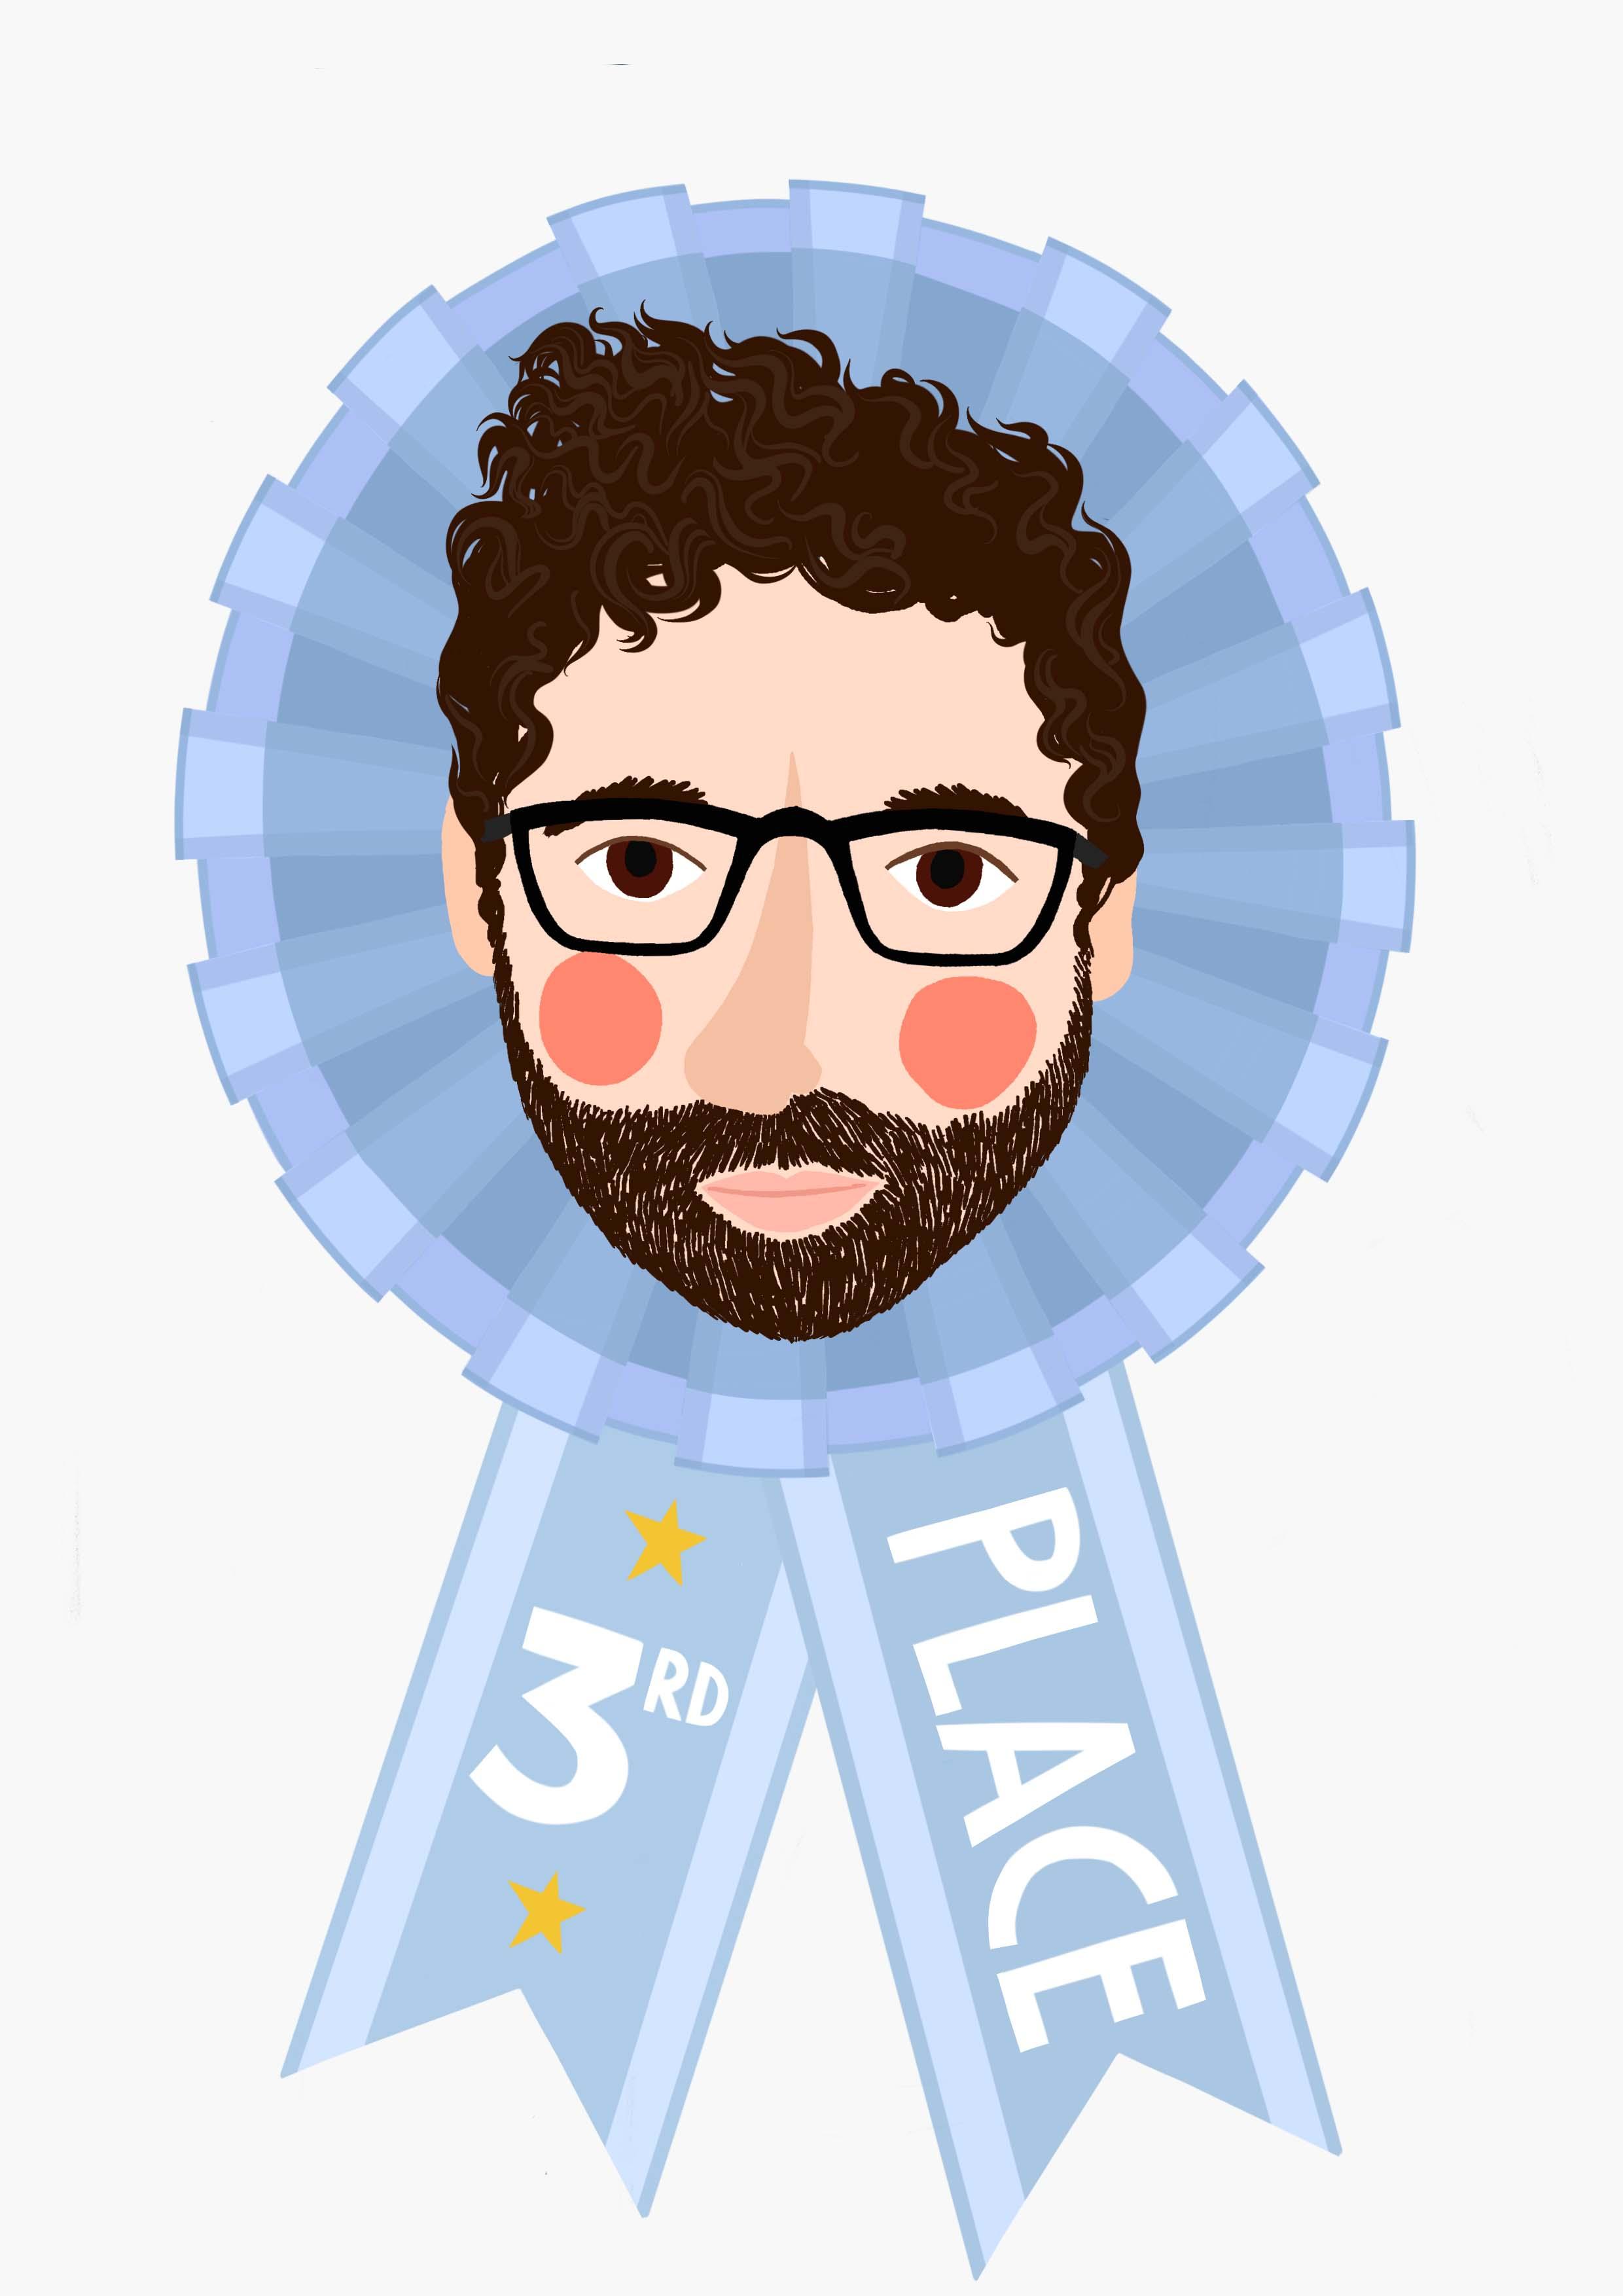 3rd-place.jpg